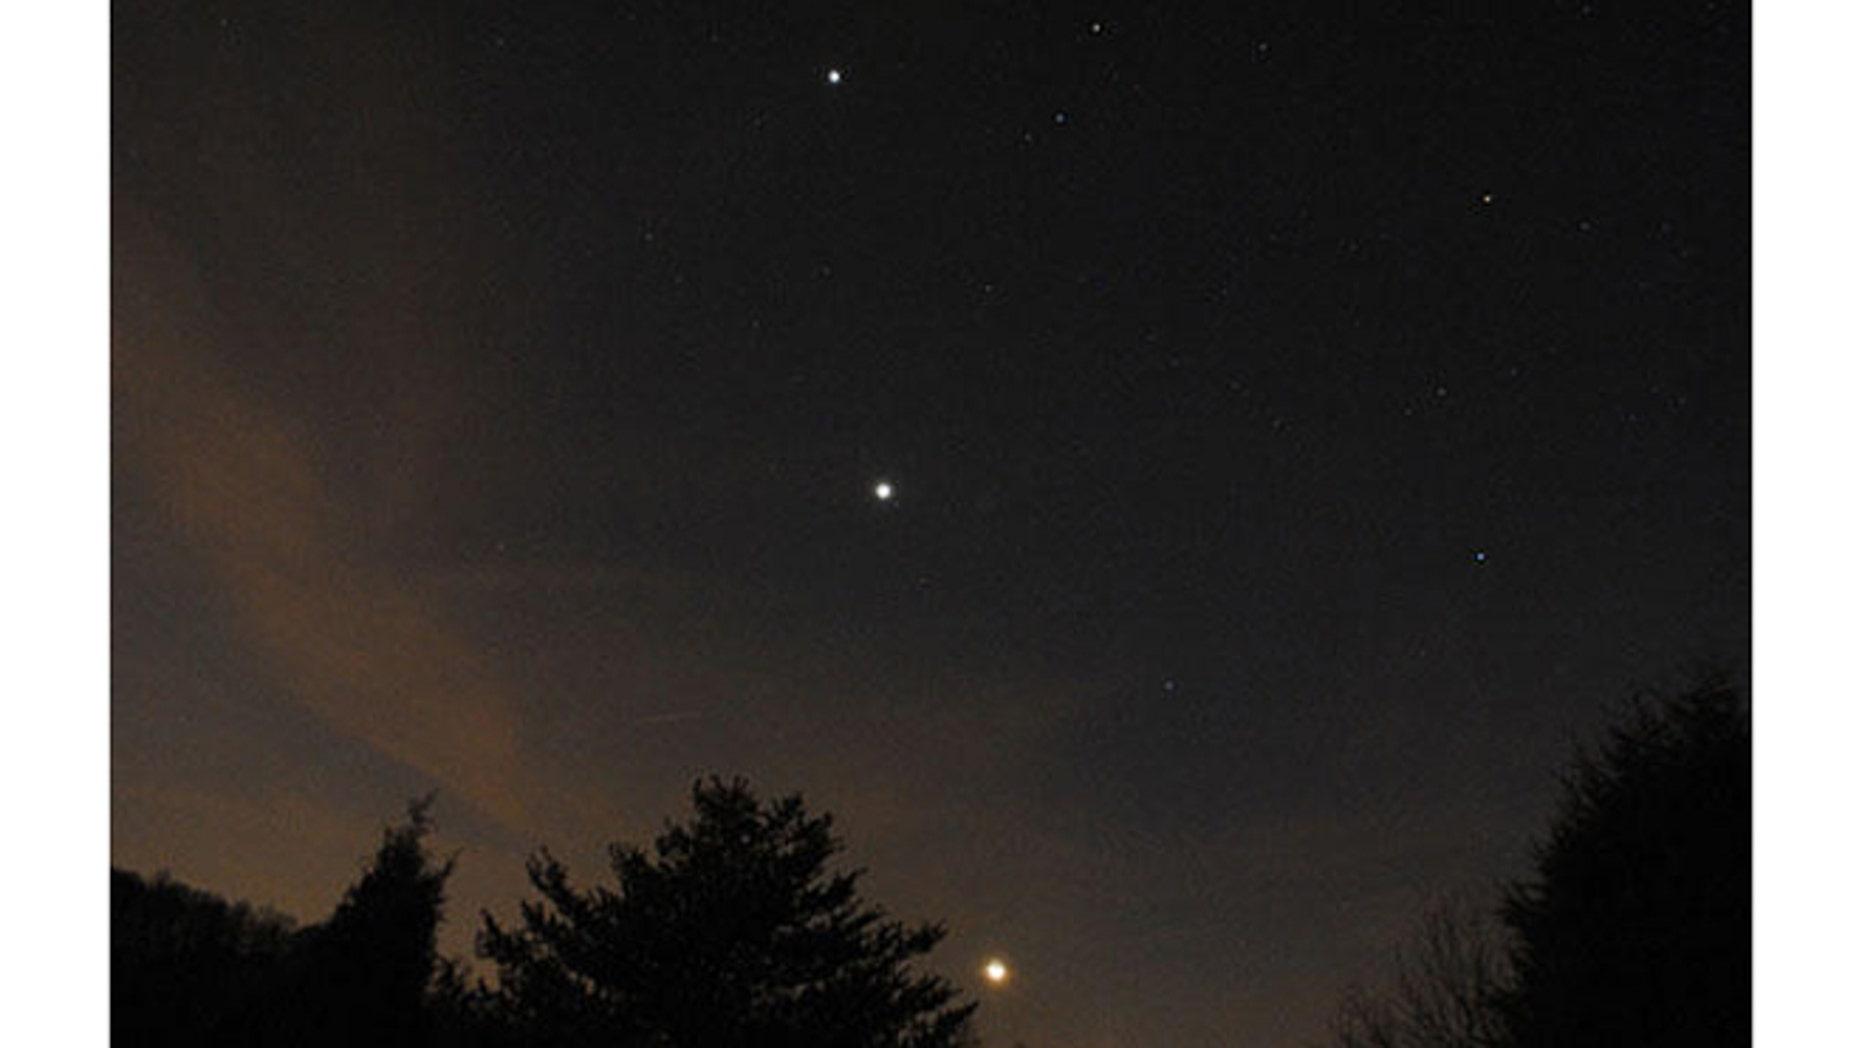 Astrophotographer John Green caught the moon, Venus and Jupiter over Mooresville, N.C., last week.